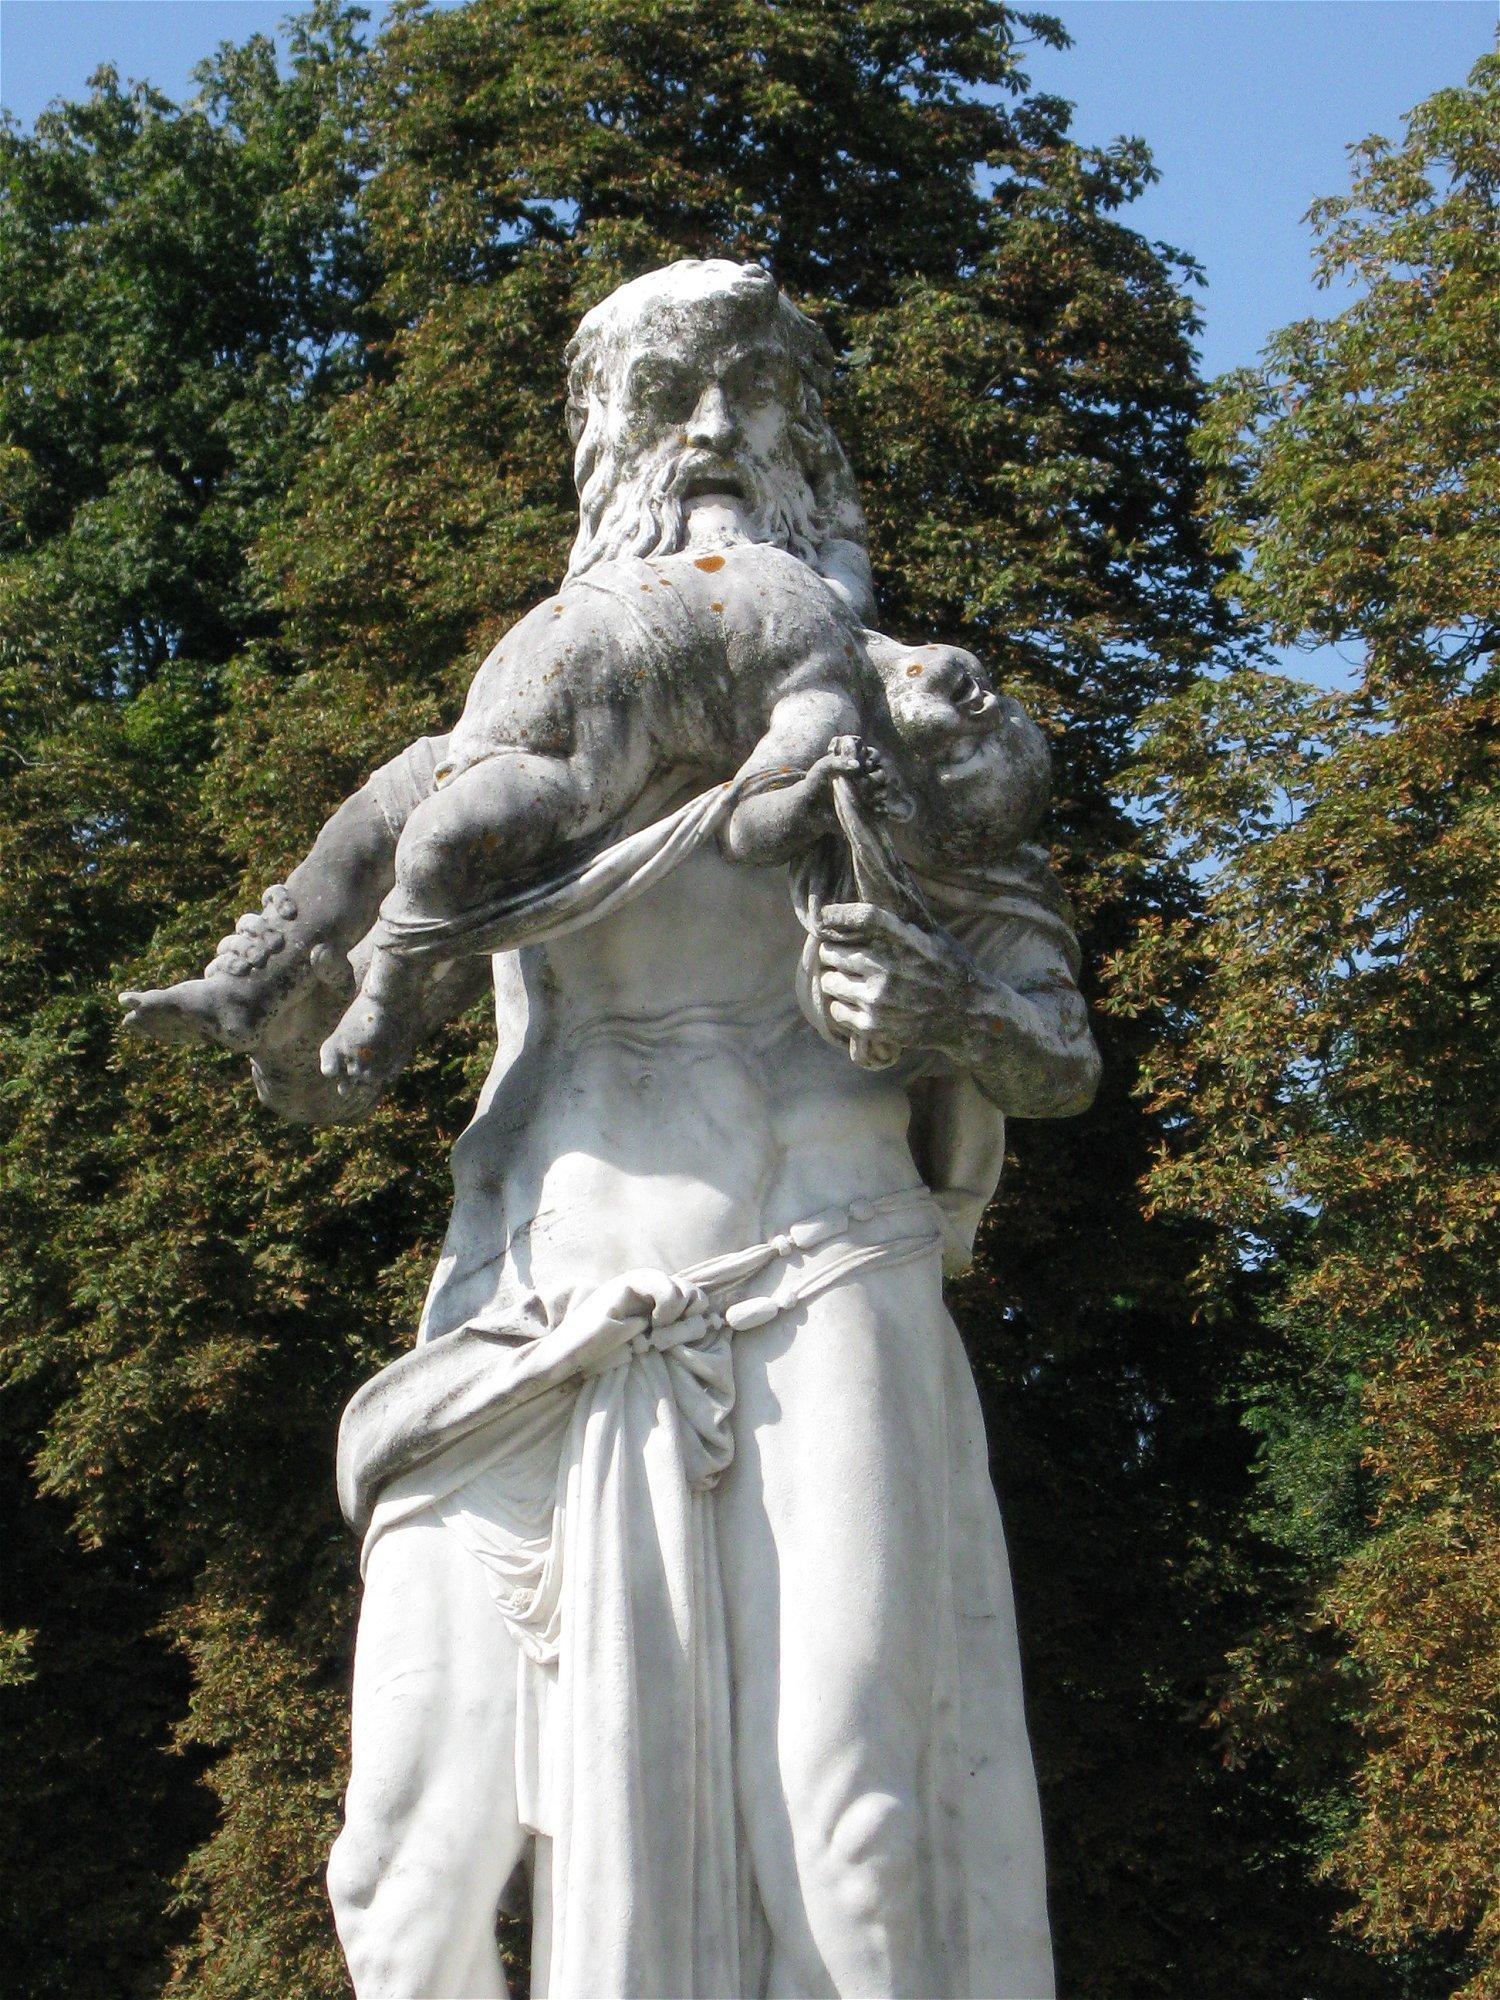 File:Nymphenburg-Statue-10b.jpg - Wikimedia Commons